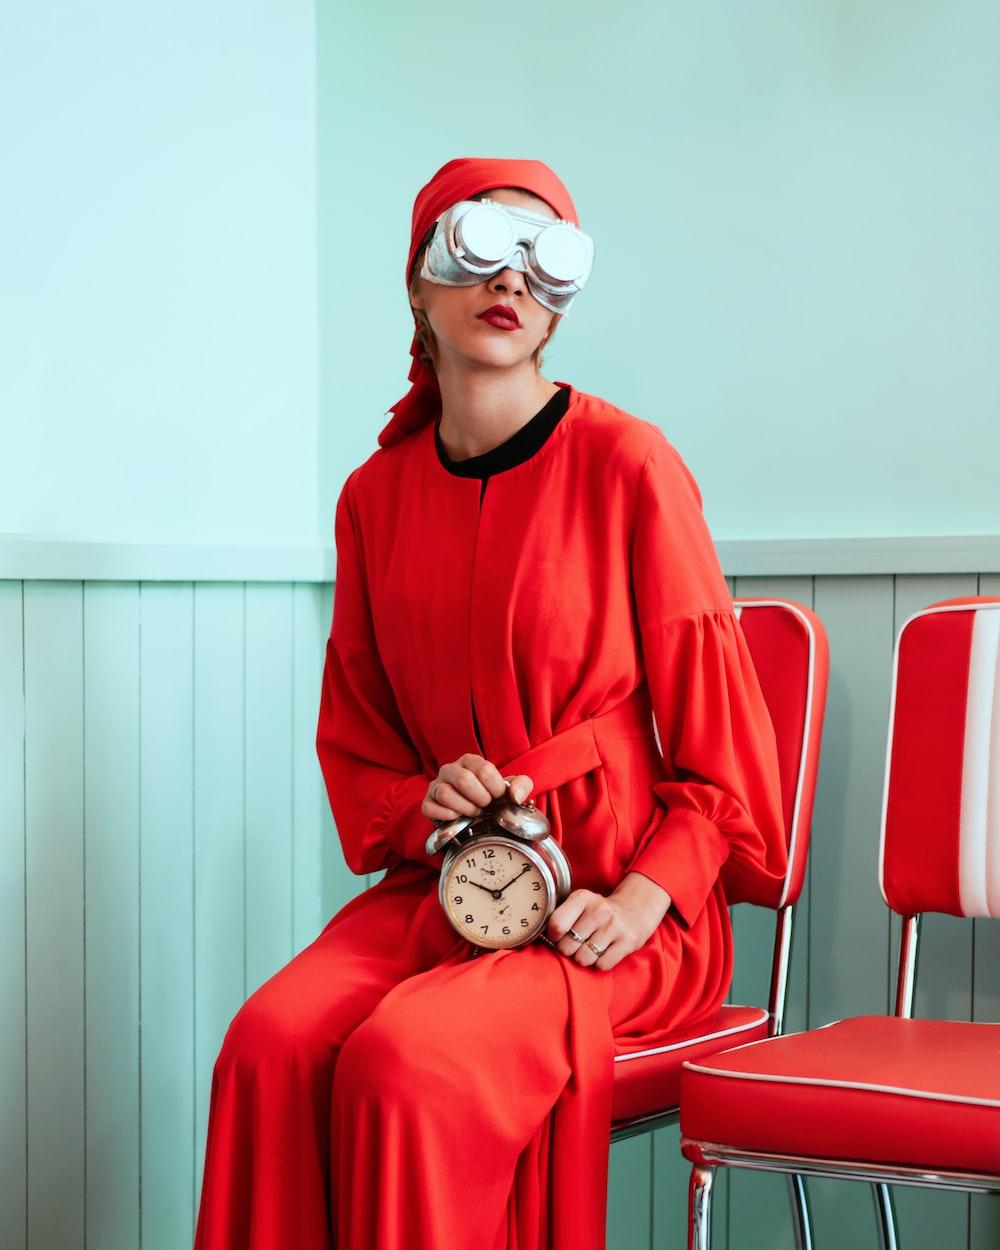 woman sitting while holding analog alarm clock